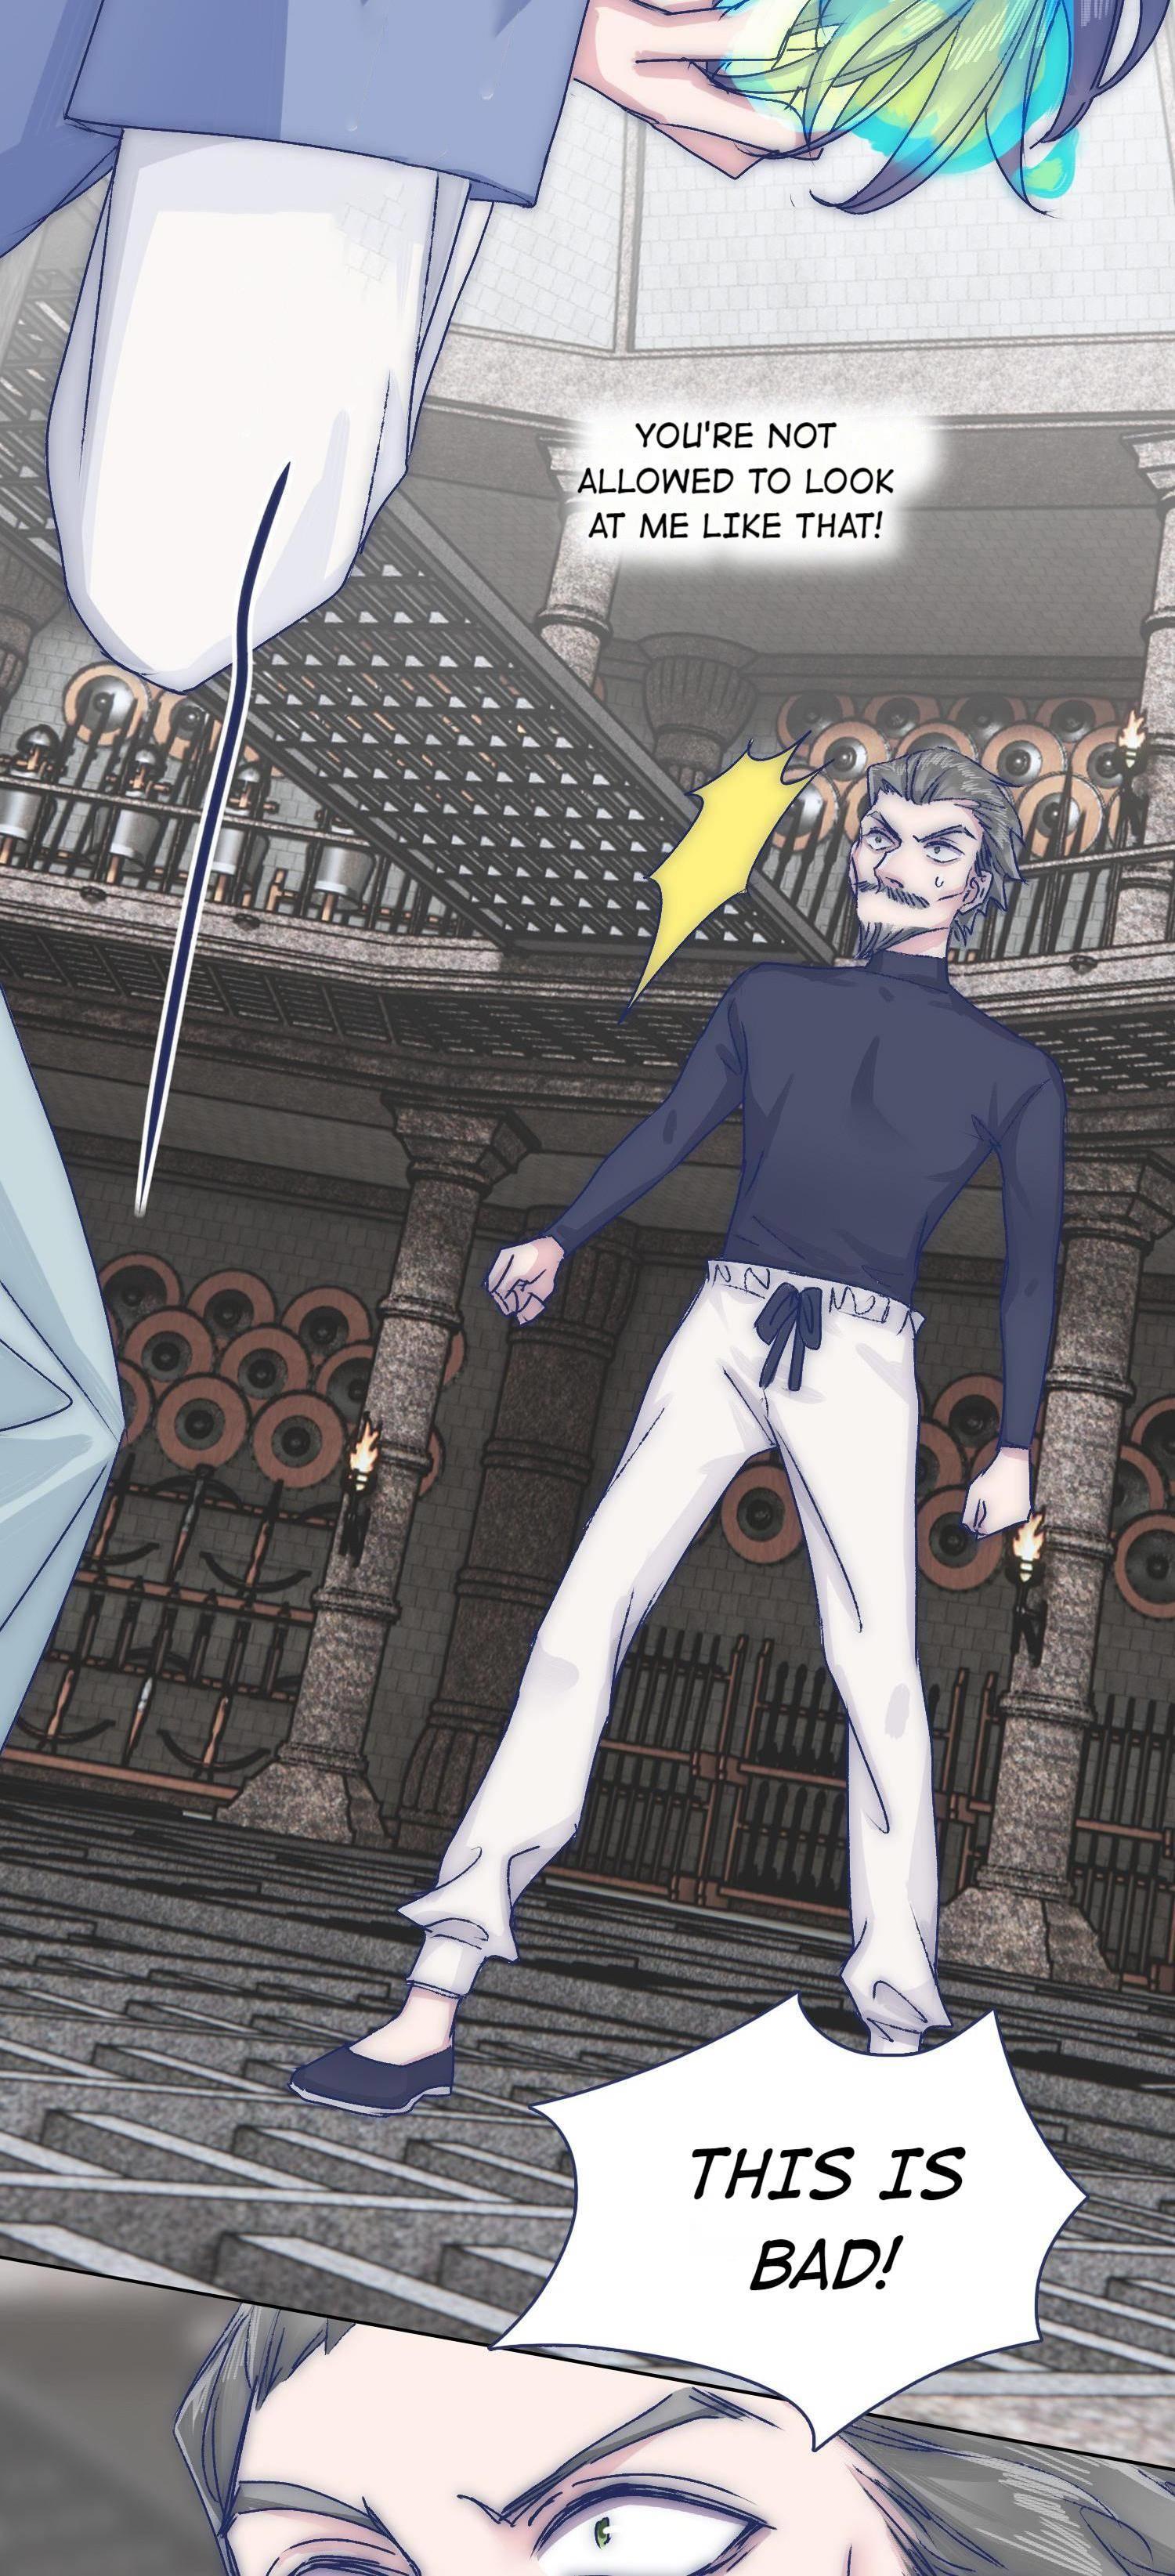 I Offer My Neck To You Chapter 71 page 36 - Mangakakalot